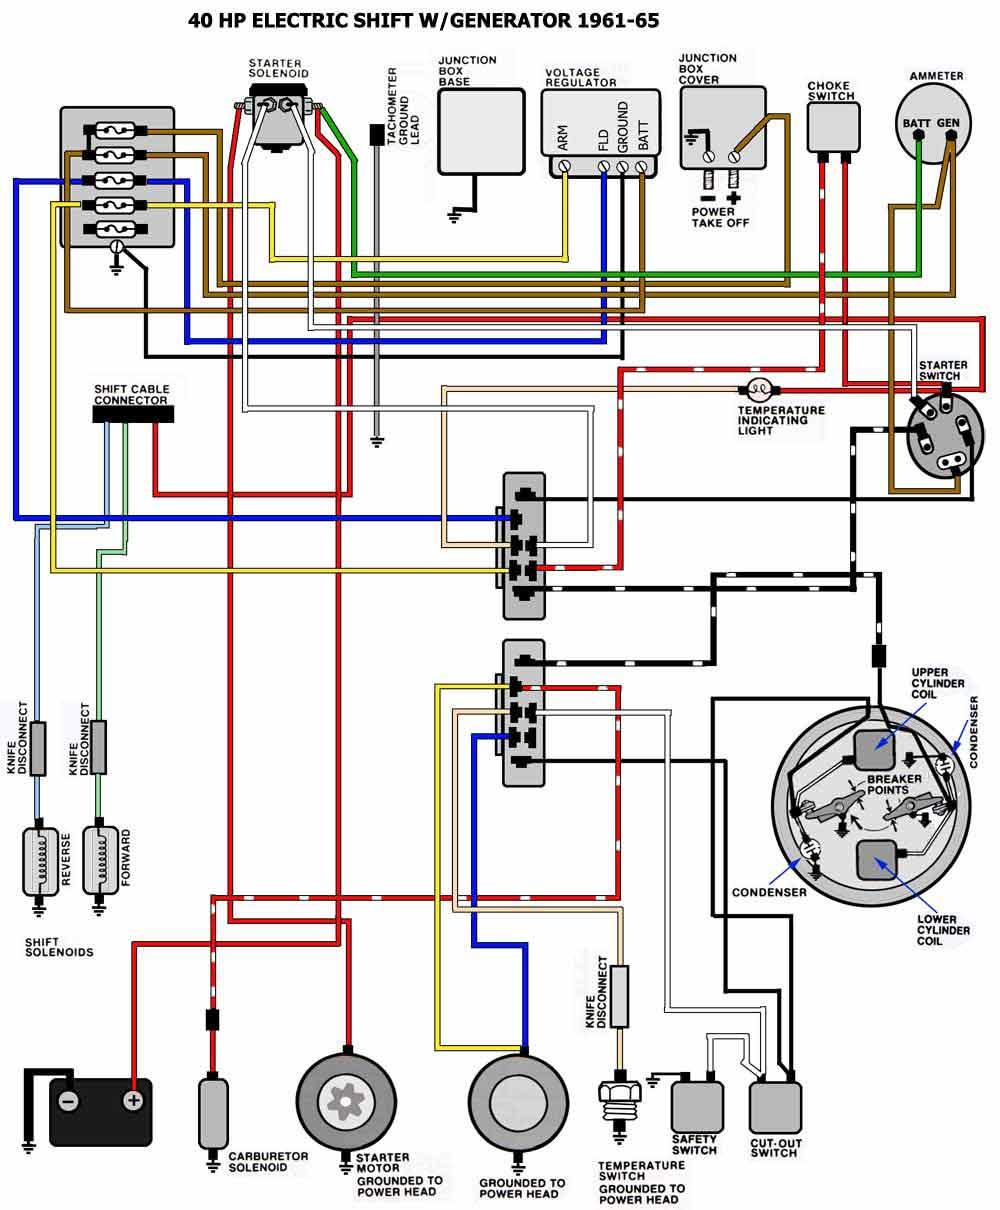 stunning pontoon boat wiring diagrams schematics images Boat Electrical Wiring pontoon boat wiring diagrams schematics Wellcraft Wiring Diagrams 4 Wire Trolling Motor Wiring Nitro Boat Wiring Diagrams Schematics